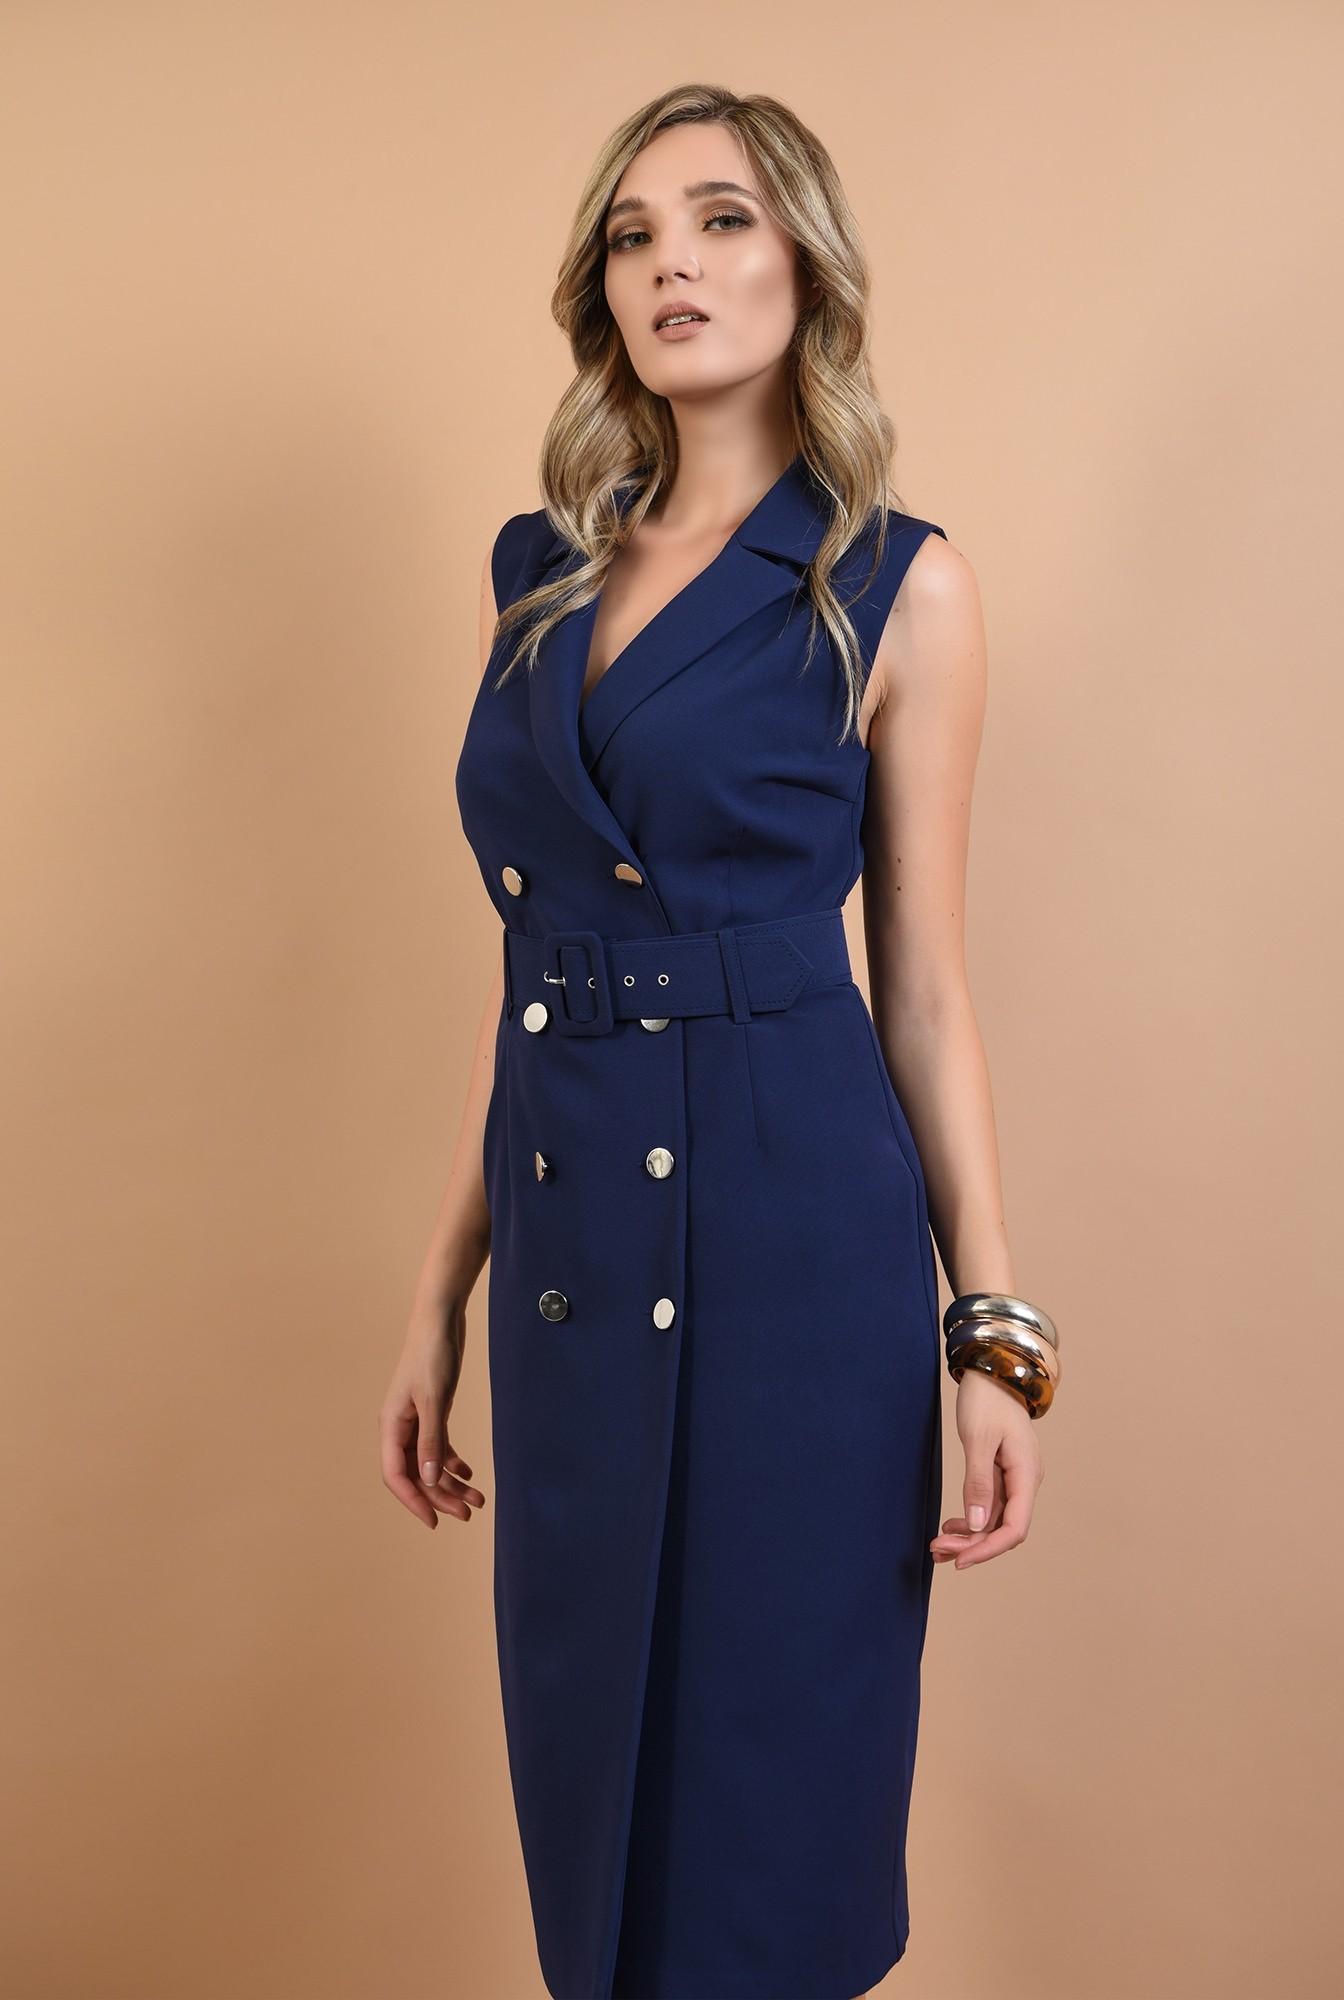 0 - 360 - rochie conica, bleumarin, cu nasturi, stil sacou, Poema